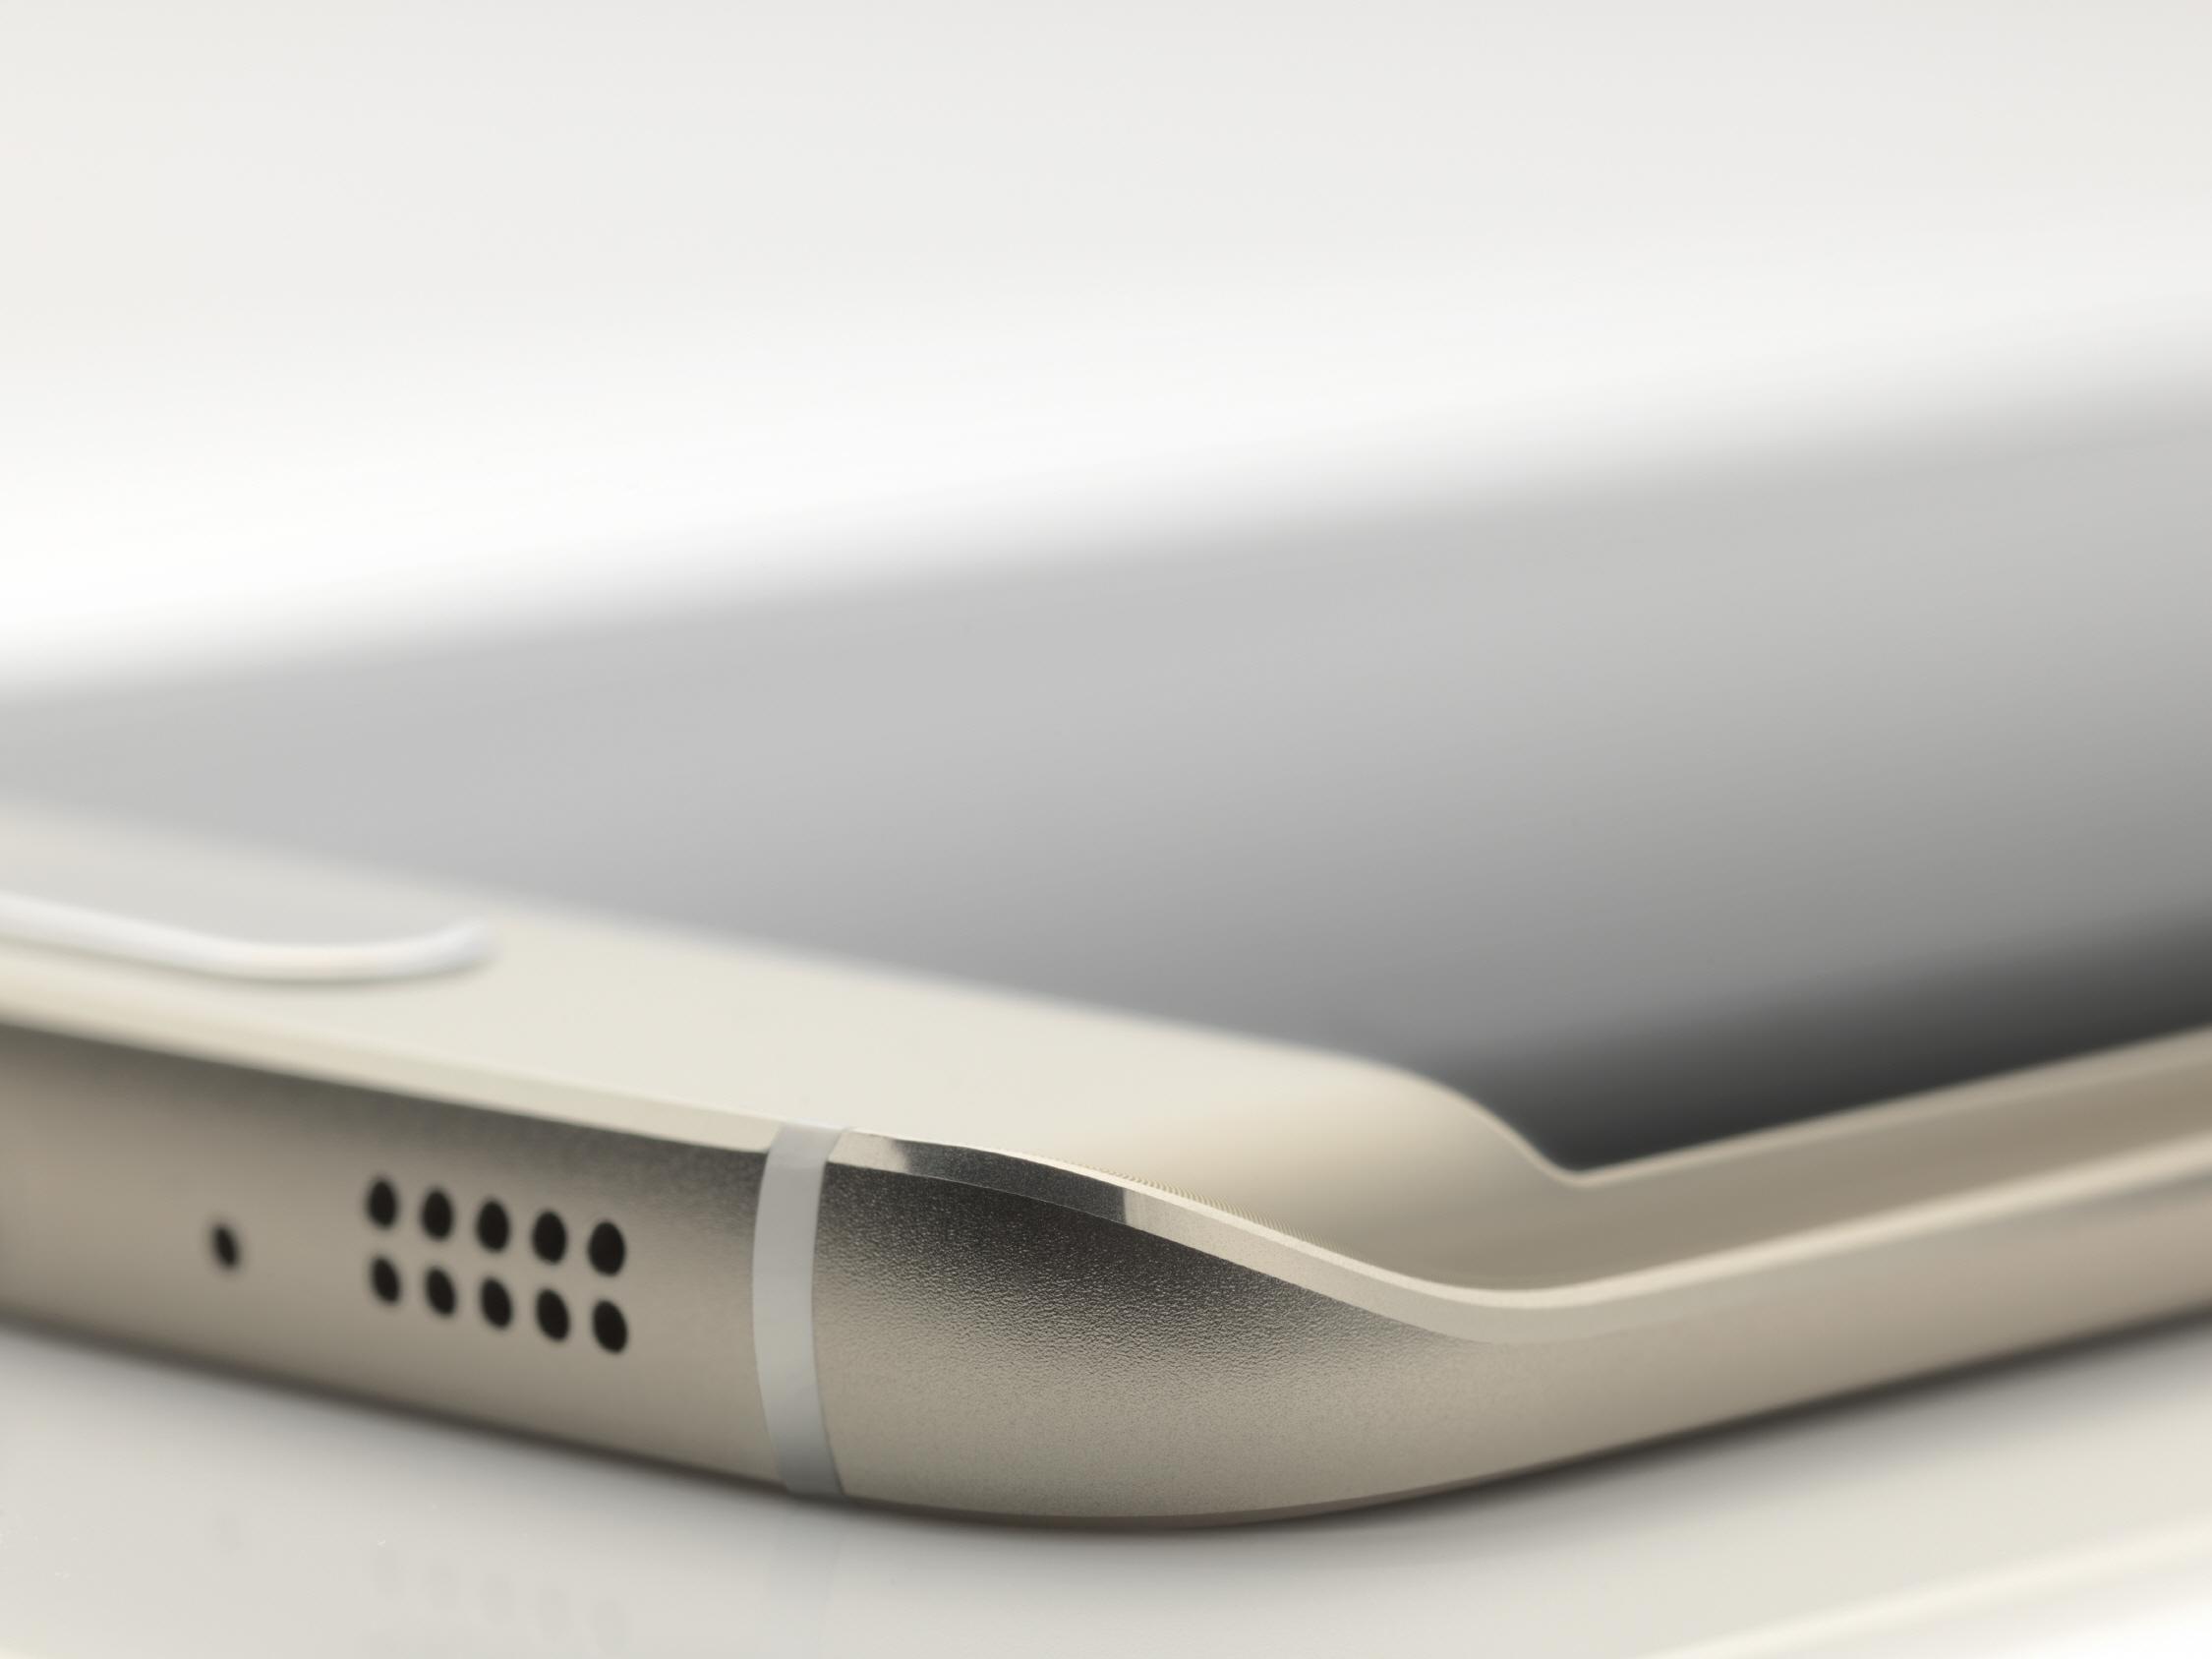 Gerücht Kommt Doch Noch Ein Galaxy S6 Mini